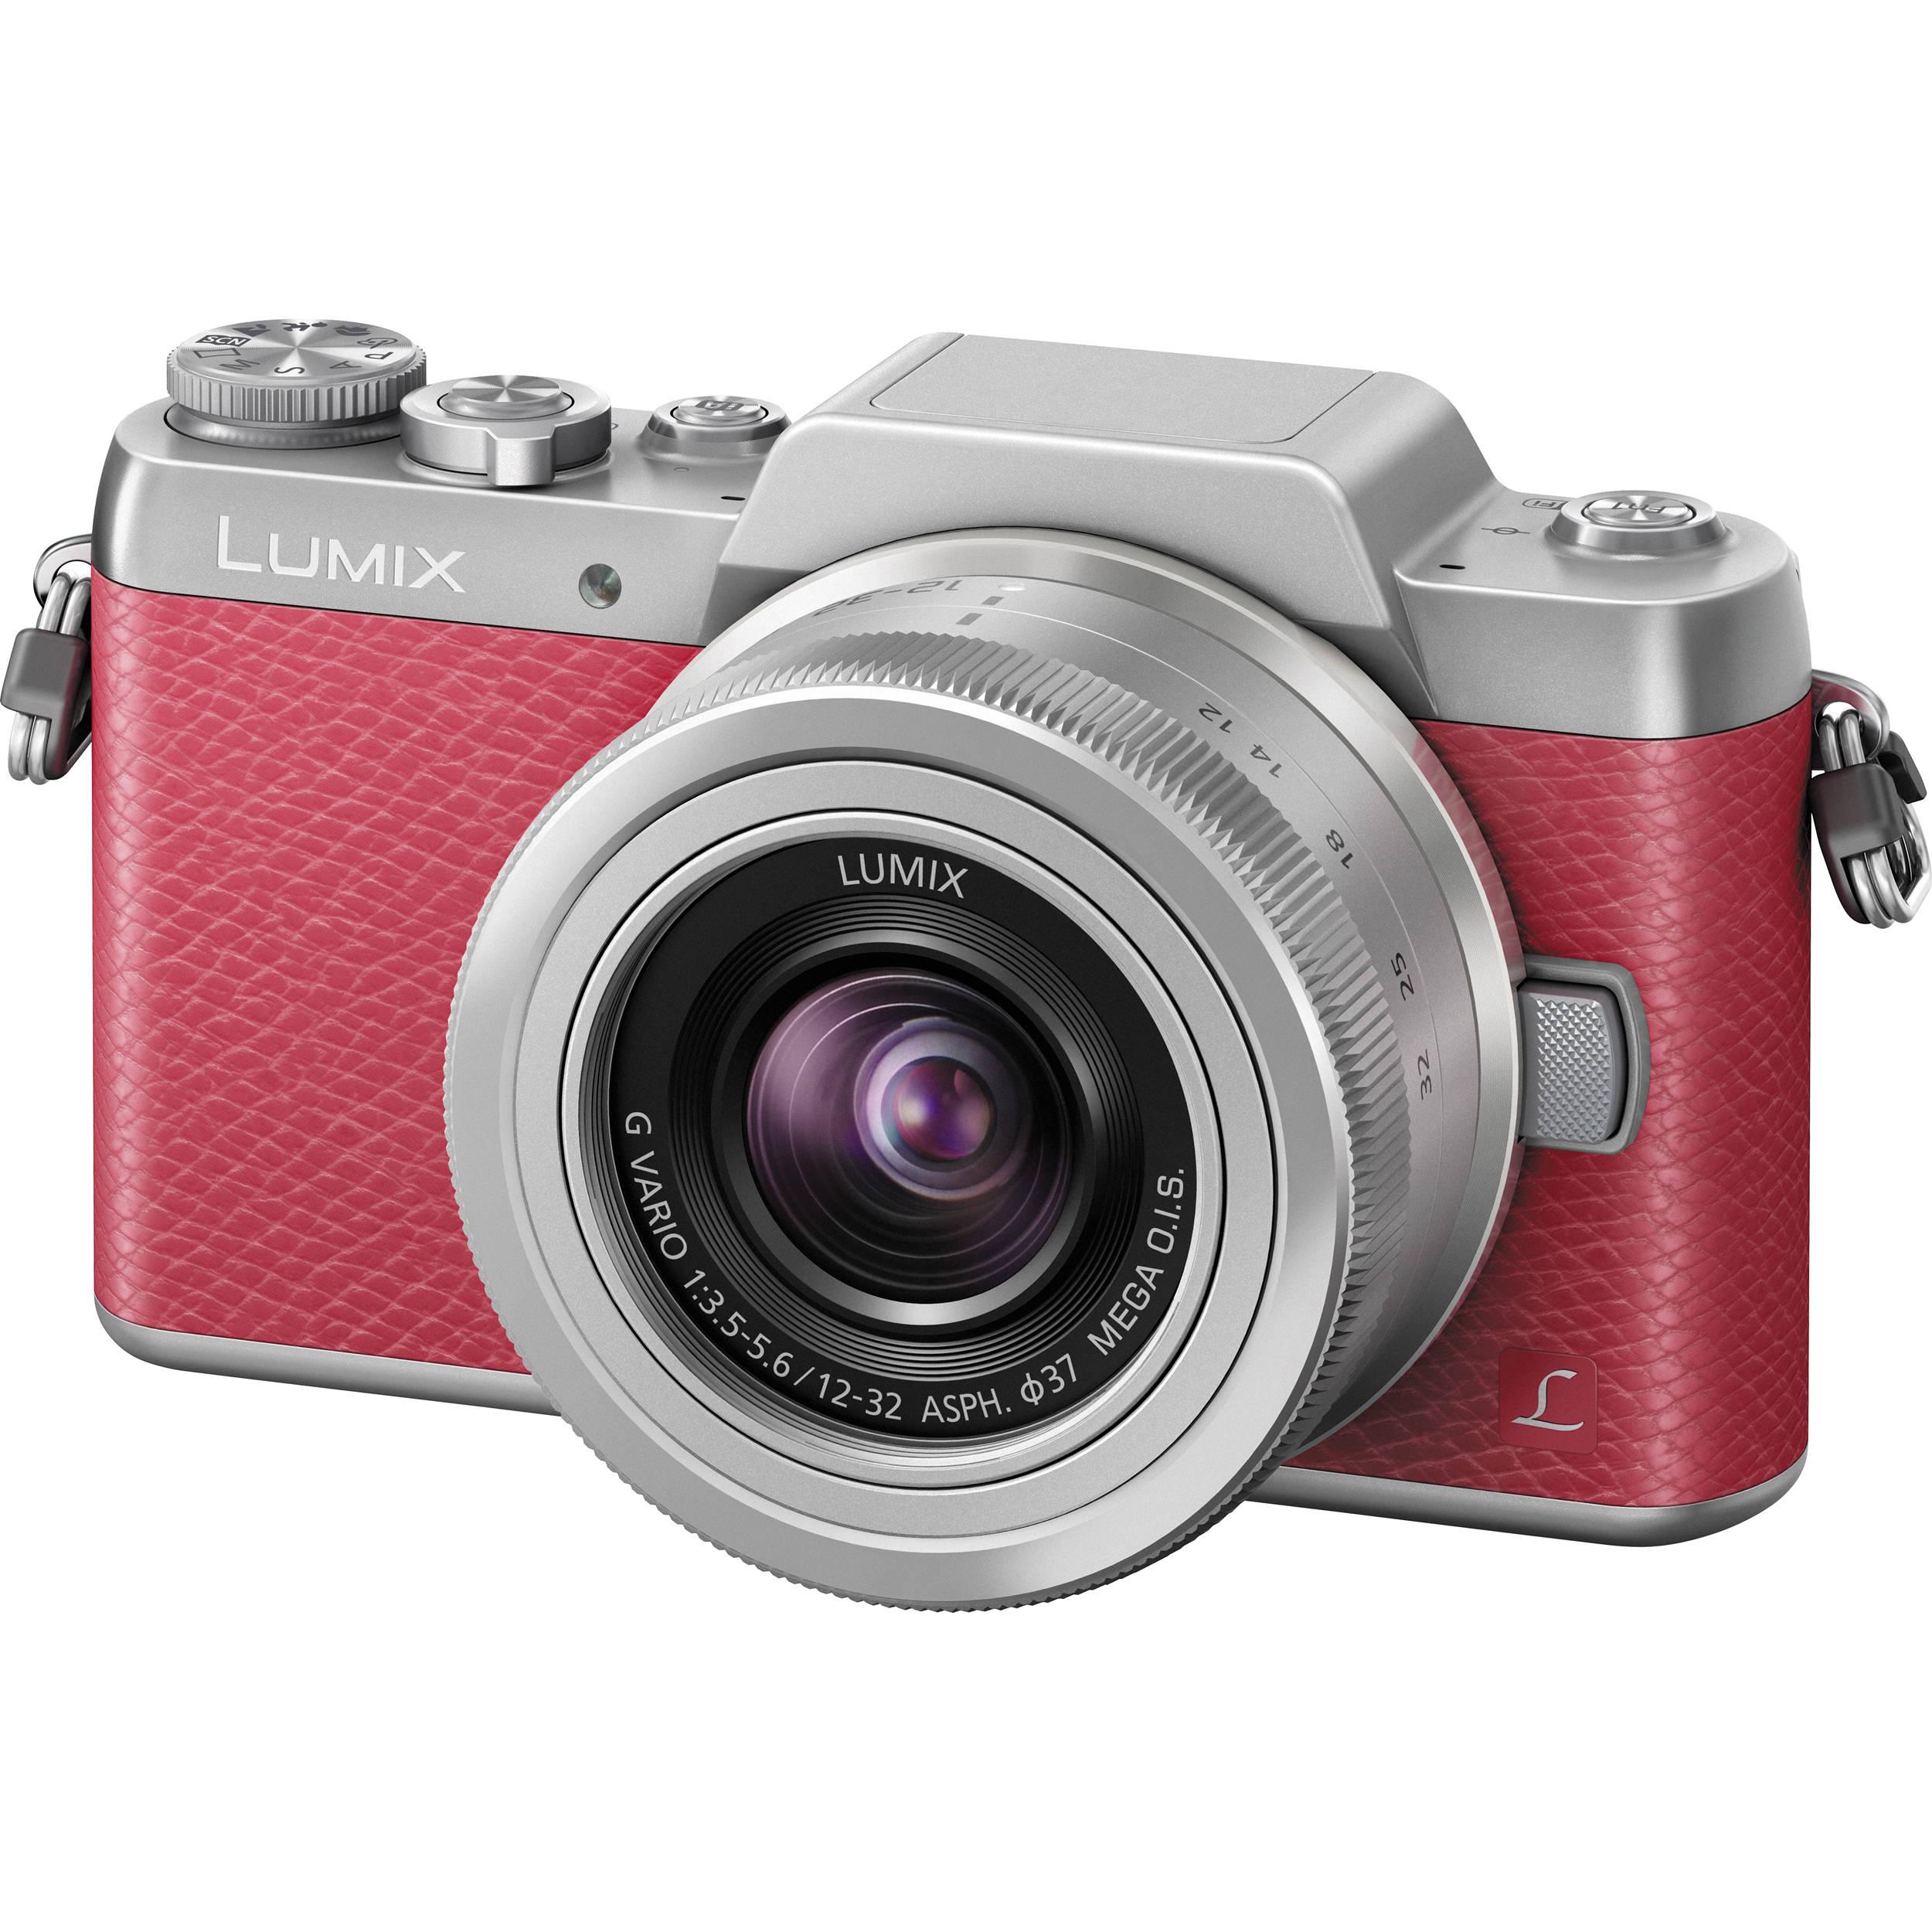 Plush Compare Fujifilm Vs Olympus Vs Panasonic Vs Fujifilm X A2 Lenses Fujifilm X A2 Review Panasonic Lumix Mirrorless Micro Four Thirds Digital Camera Lens dpreview Fujifilm X A2